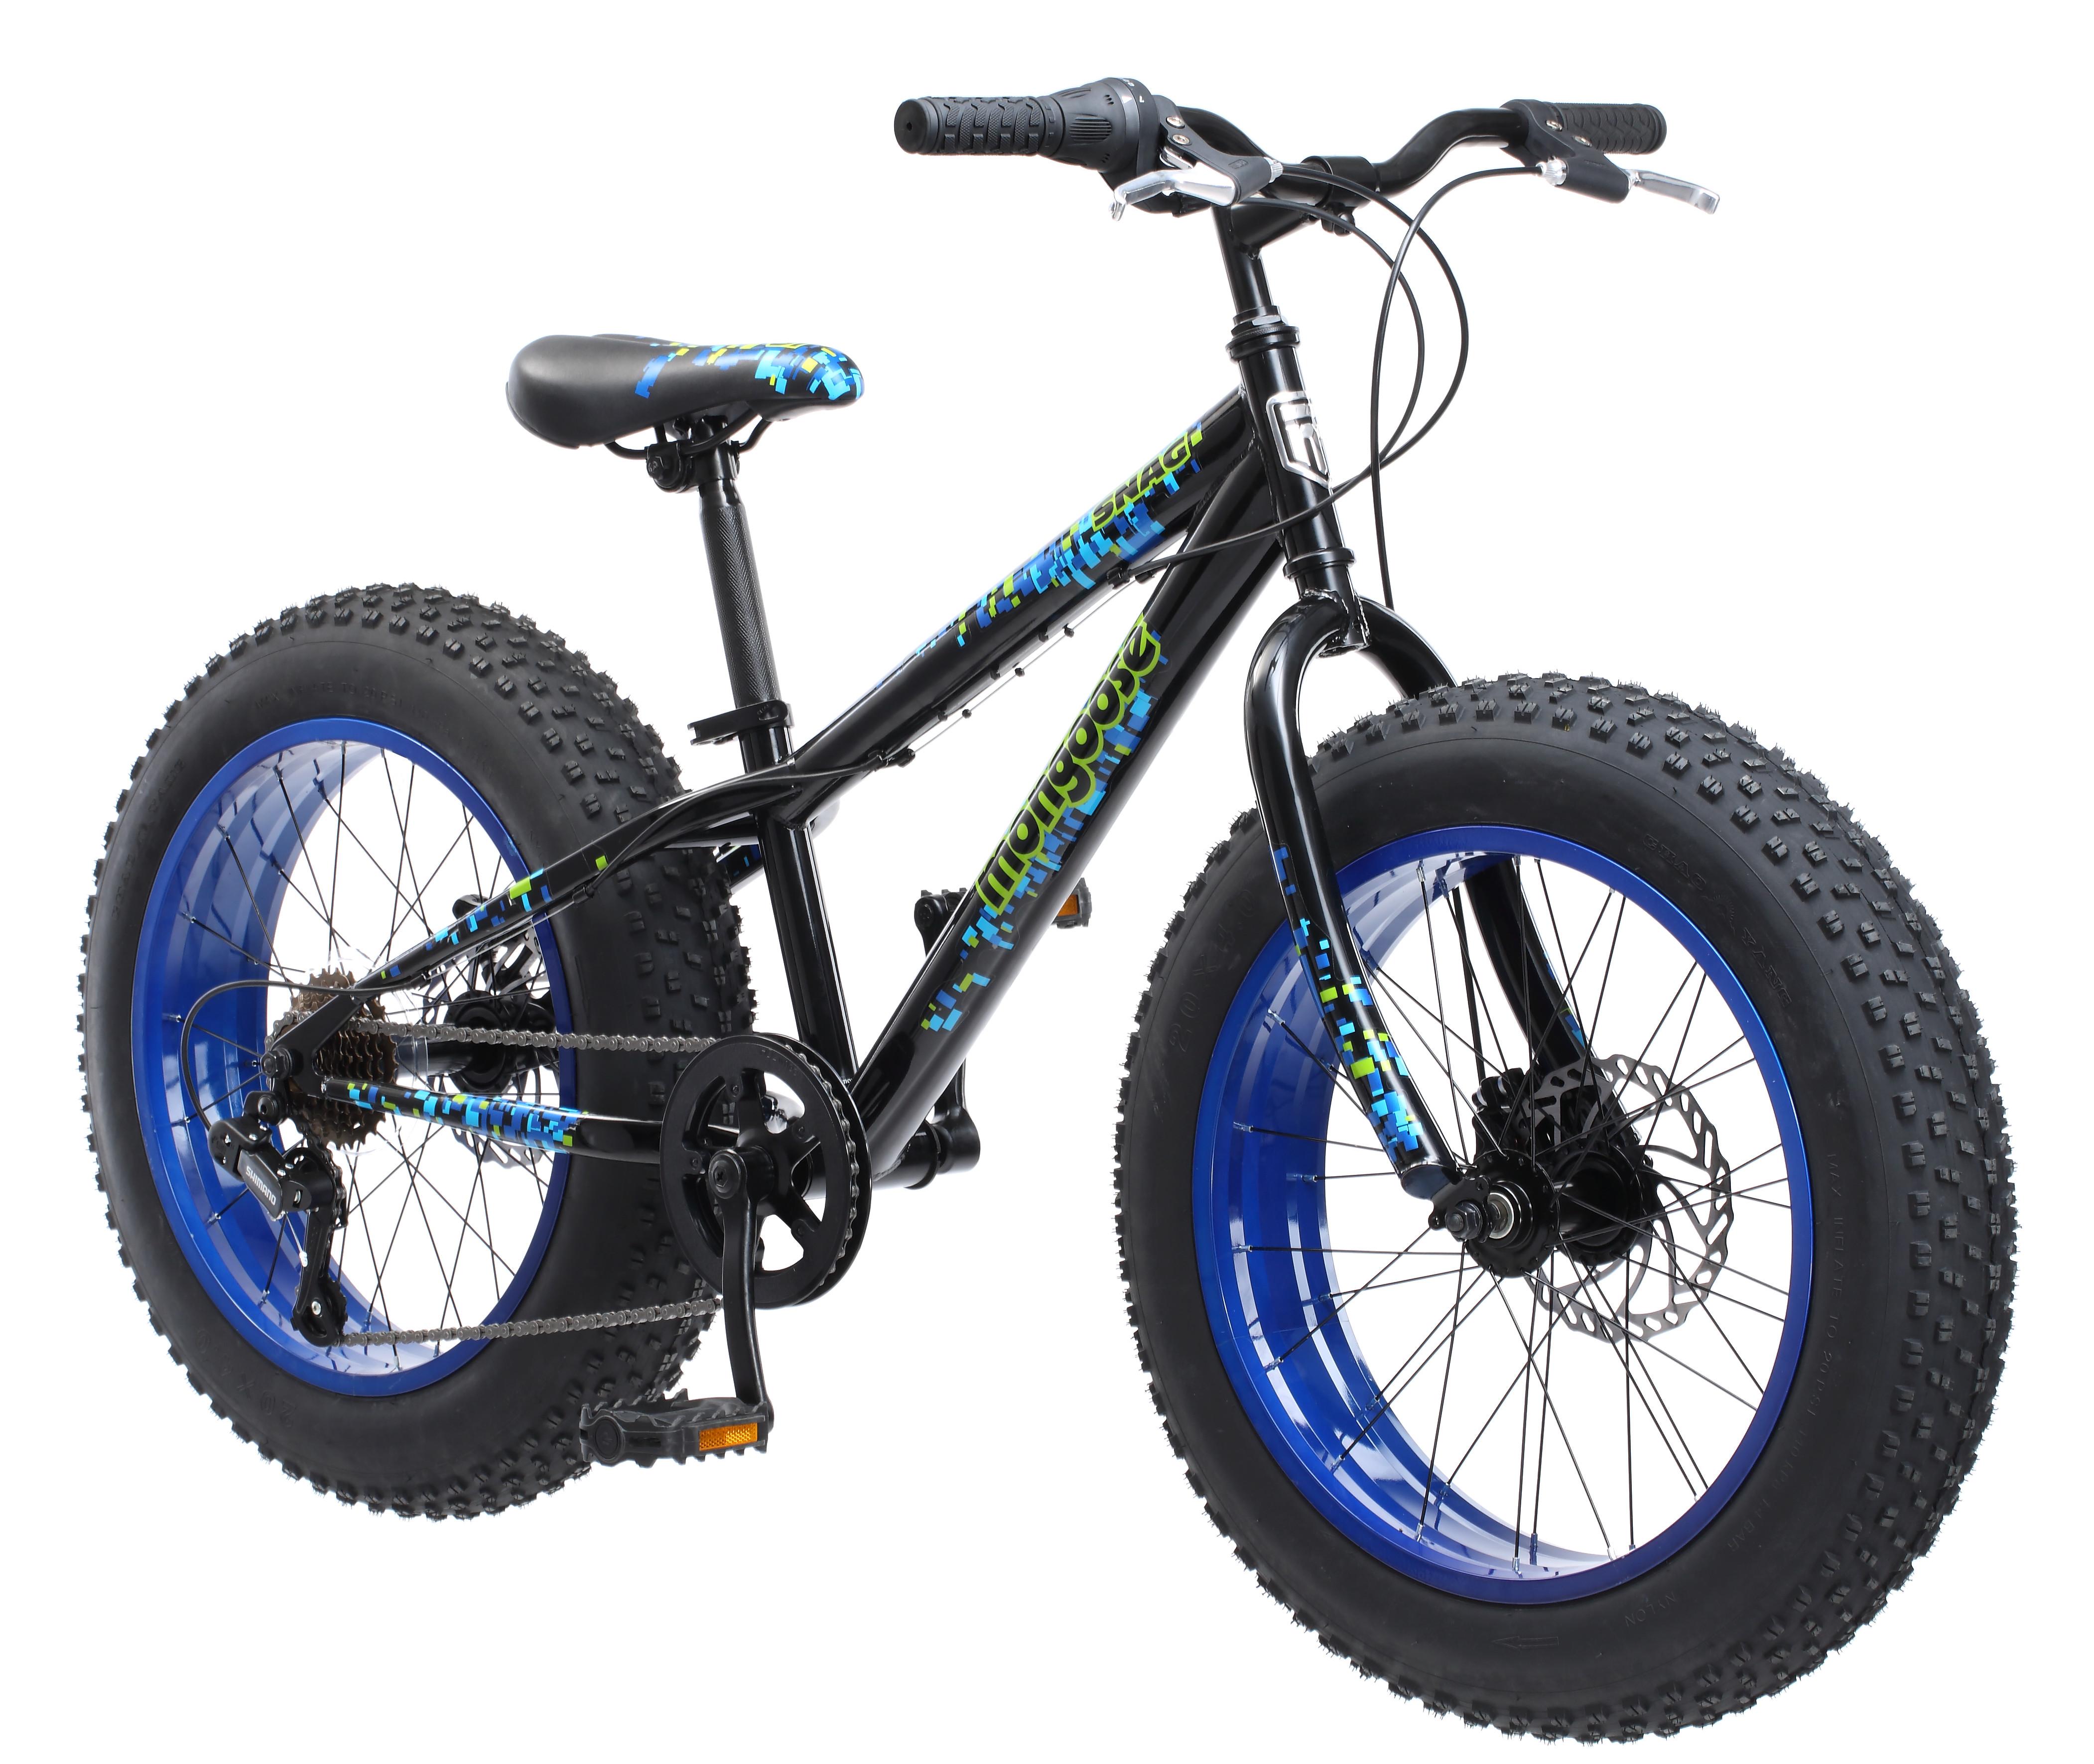 everest mountain bike review kmart